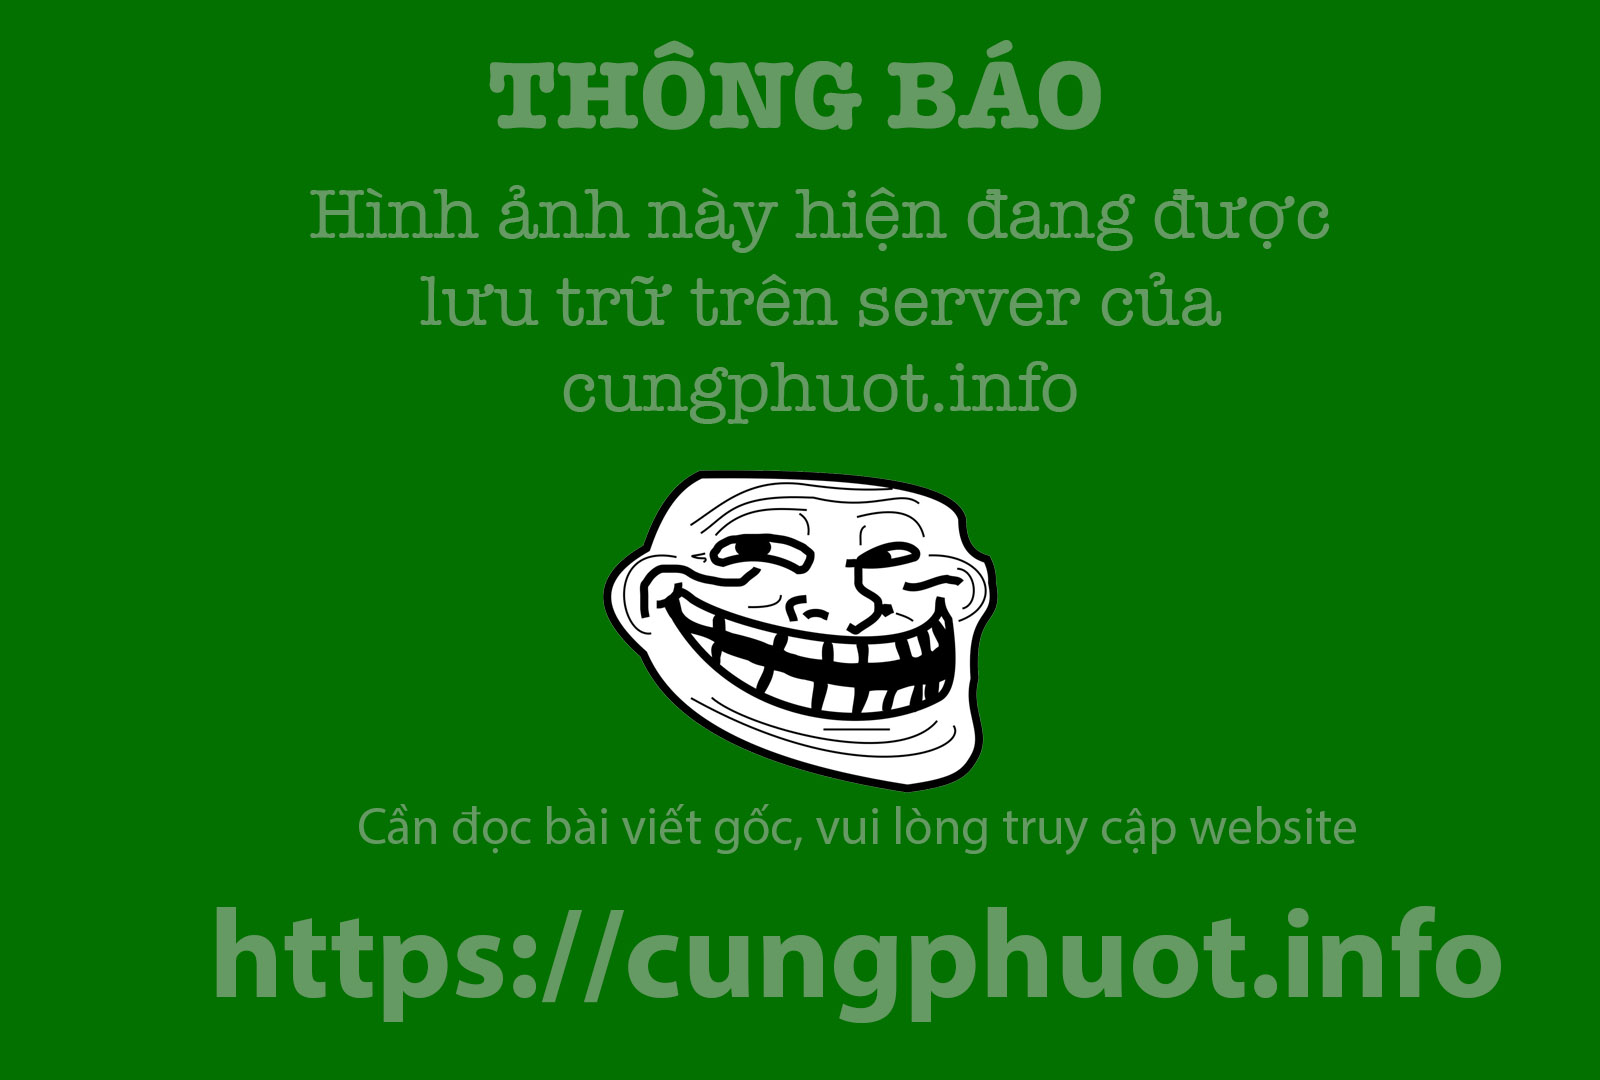 Binh minh tuyet dep tren nhung doi che Tan Cuong hinh anh 3